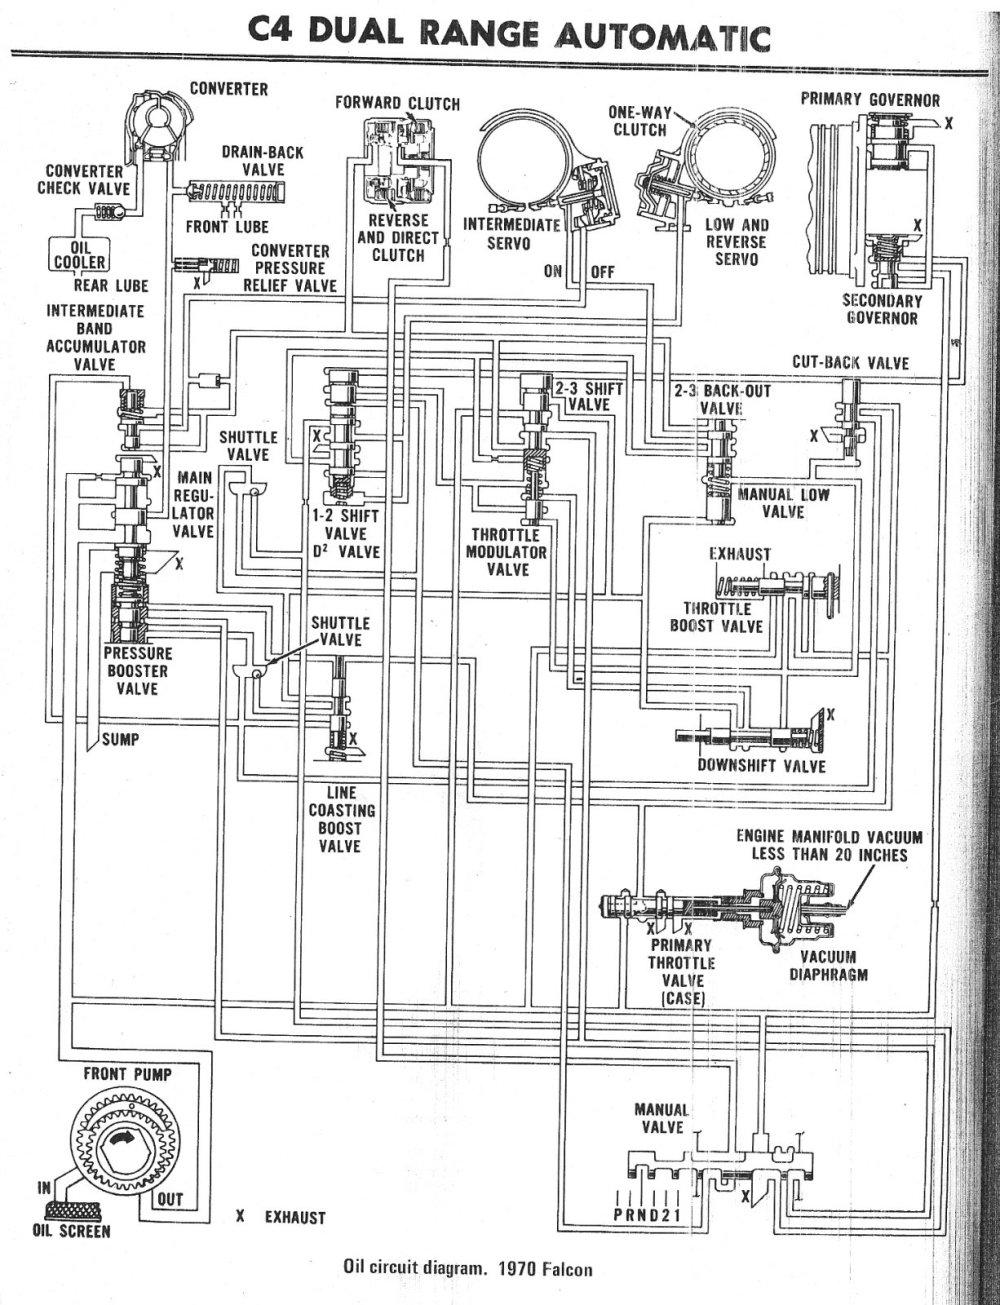 medium resolution of c4 question vintage mustang forums 1970 ford c4 transmission diagram c4 transmission diagram